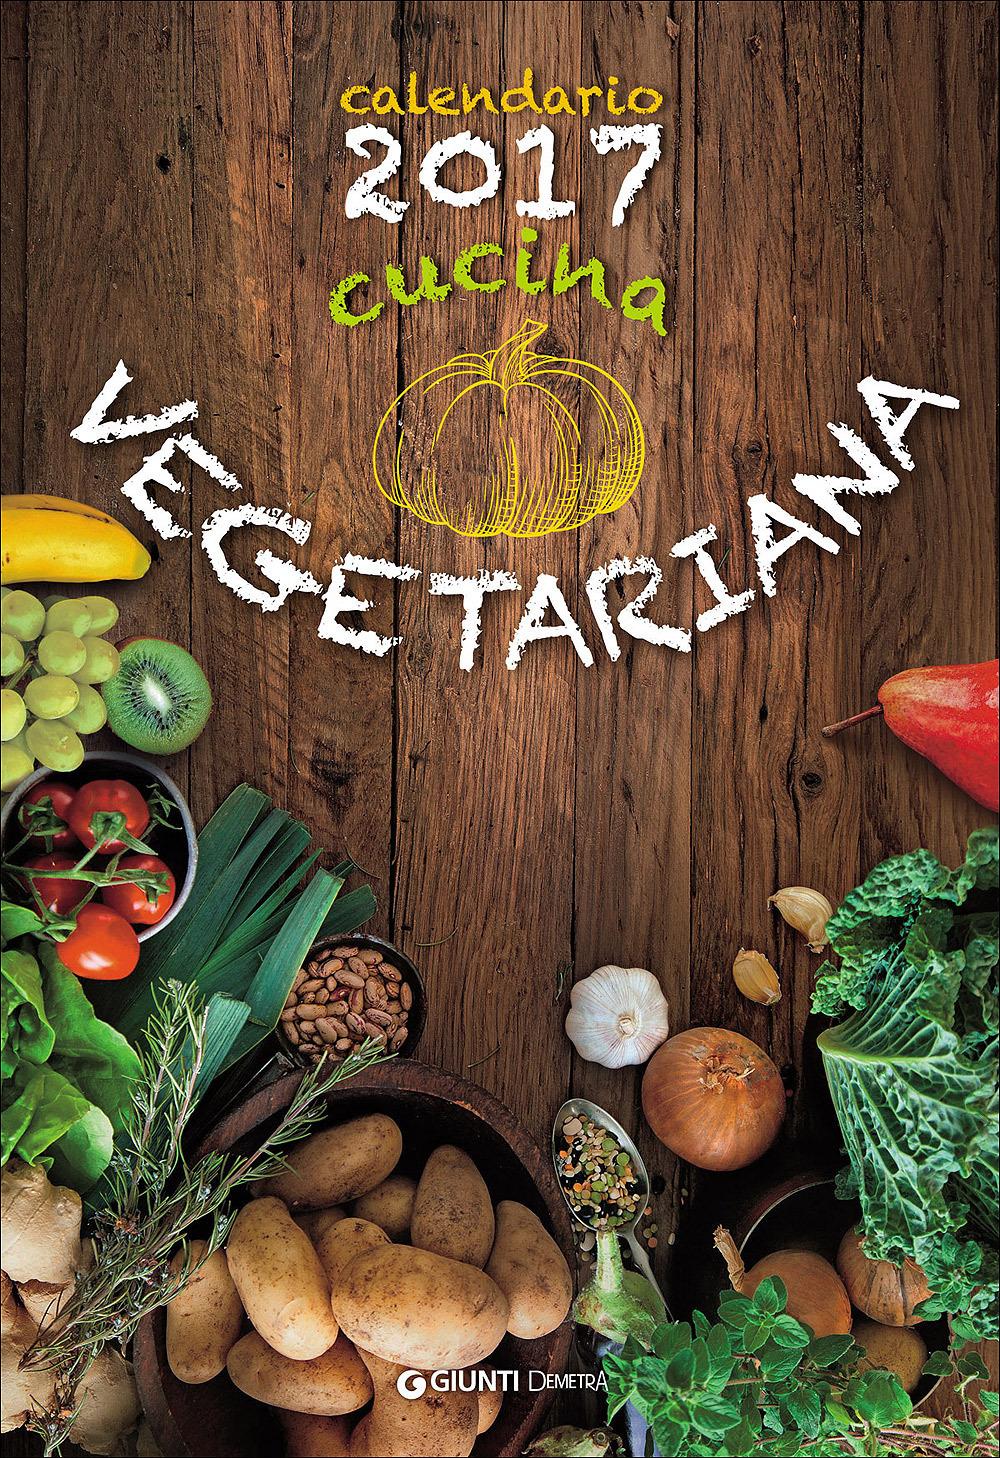 Cucina vegetariana. Calendario 2017